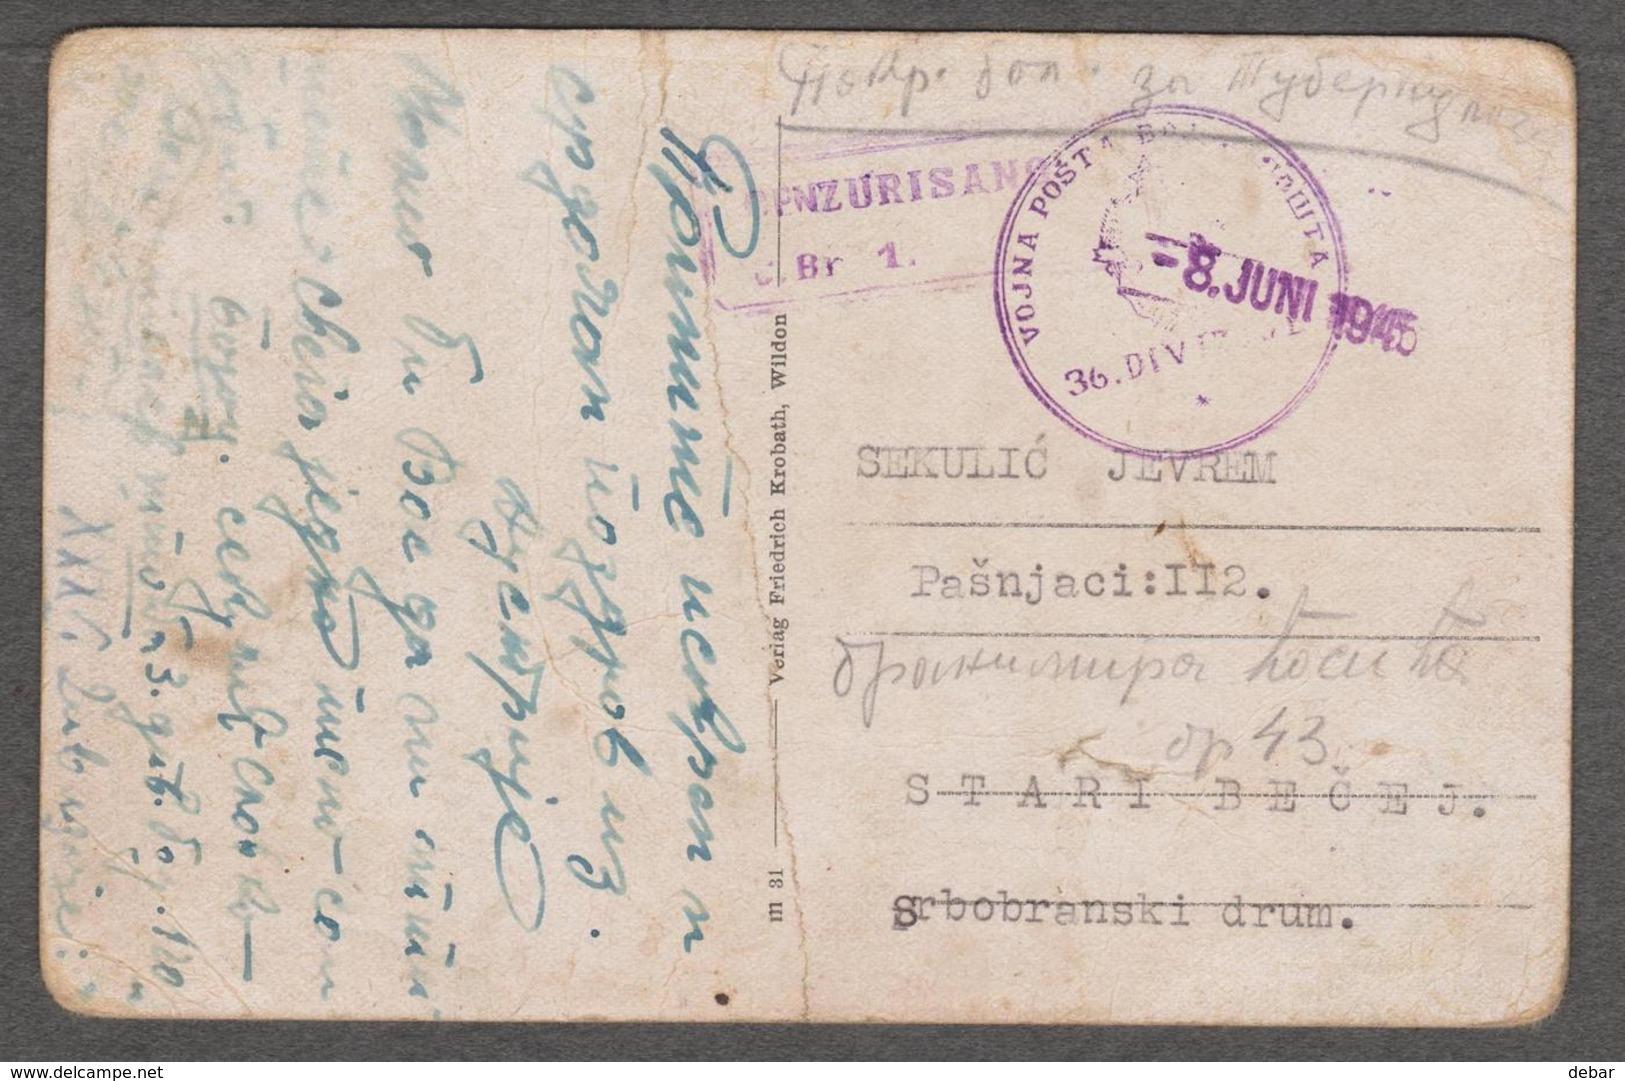 POSCARD - VOJNA POSTA 36.DIVIZIJE  -8.JUNI  1945 - GROS - FLORIAN,STEIERMARK - Gebraucht